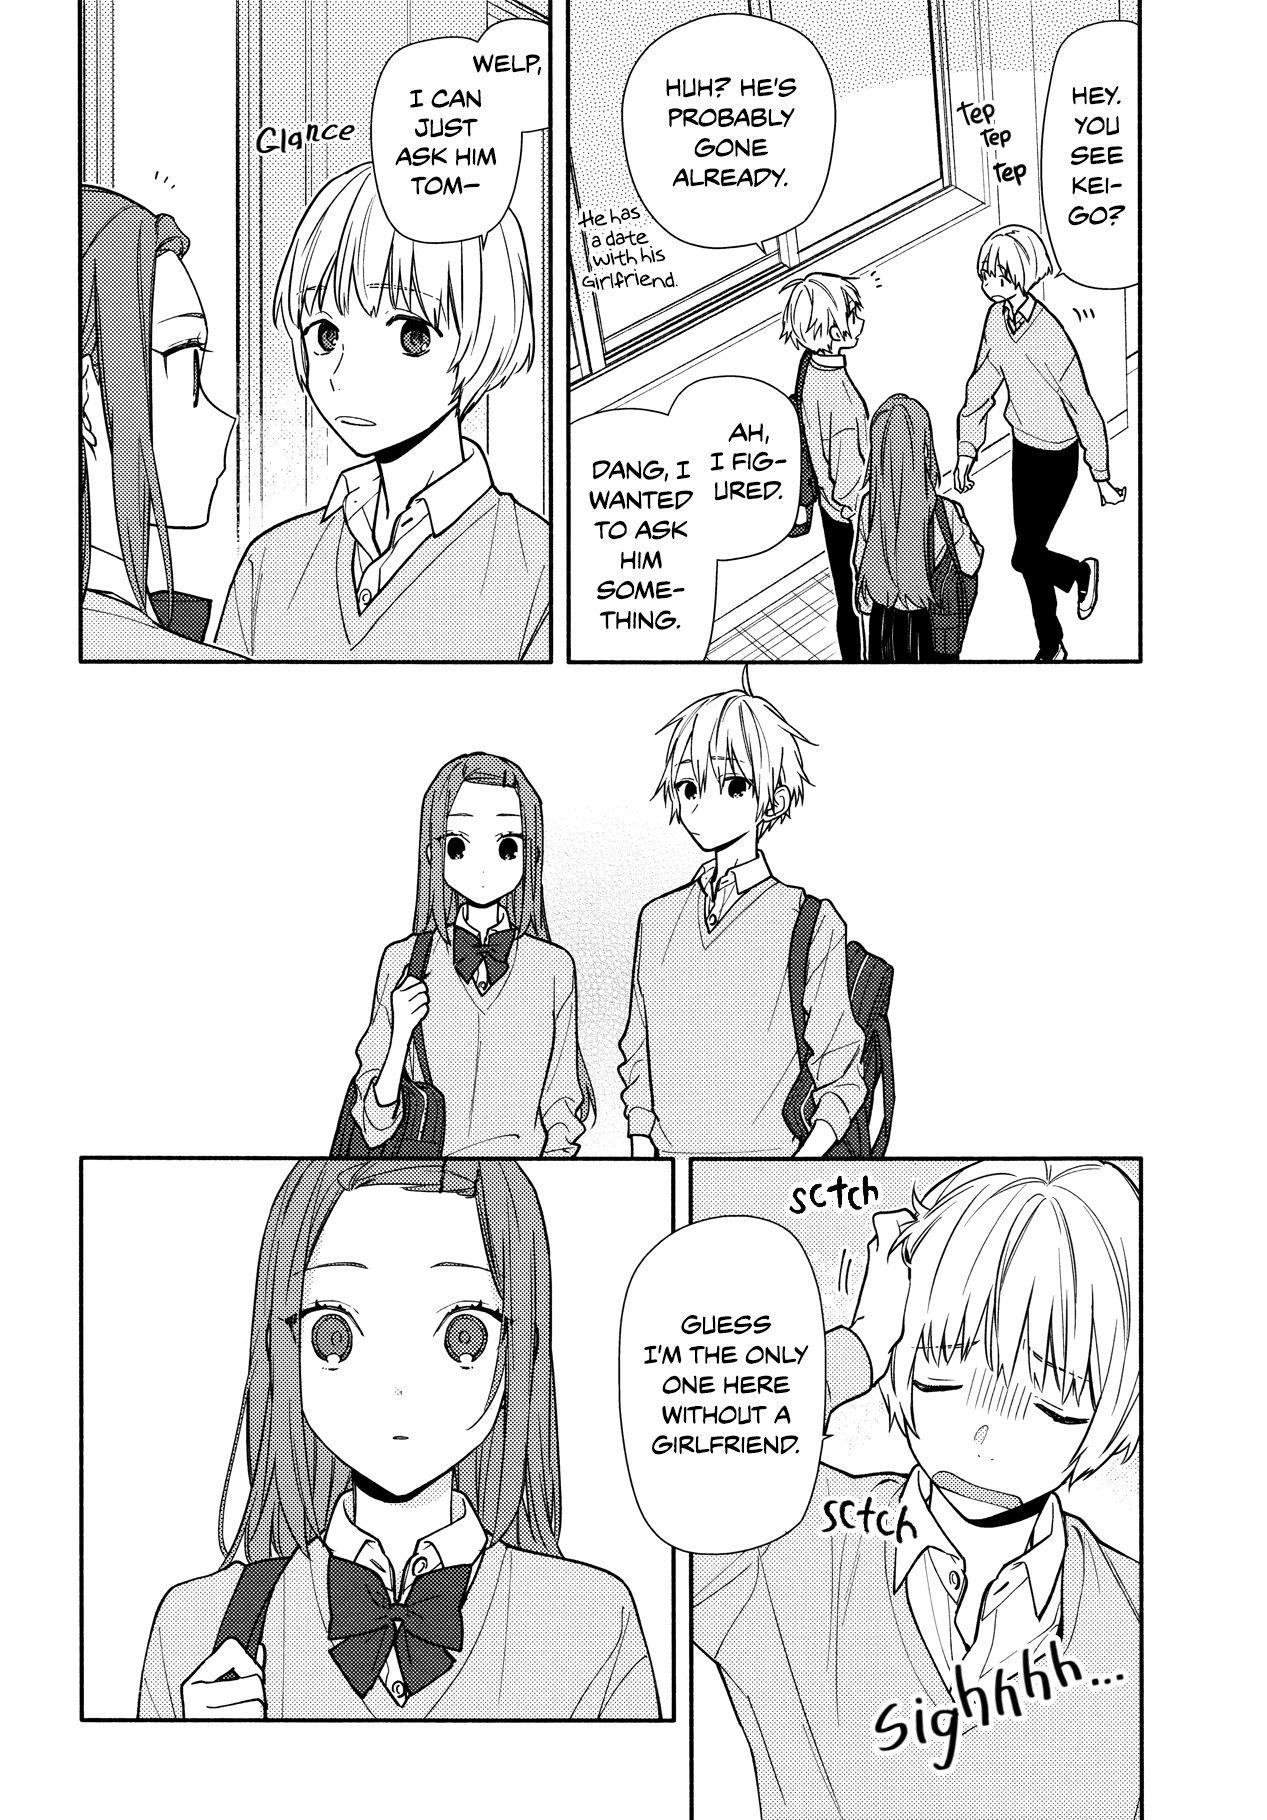 Horimiya, Chapter 121 Page 4